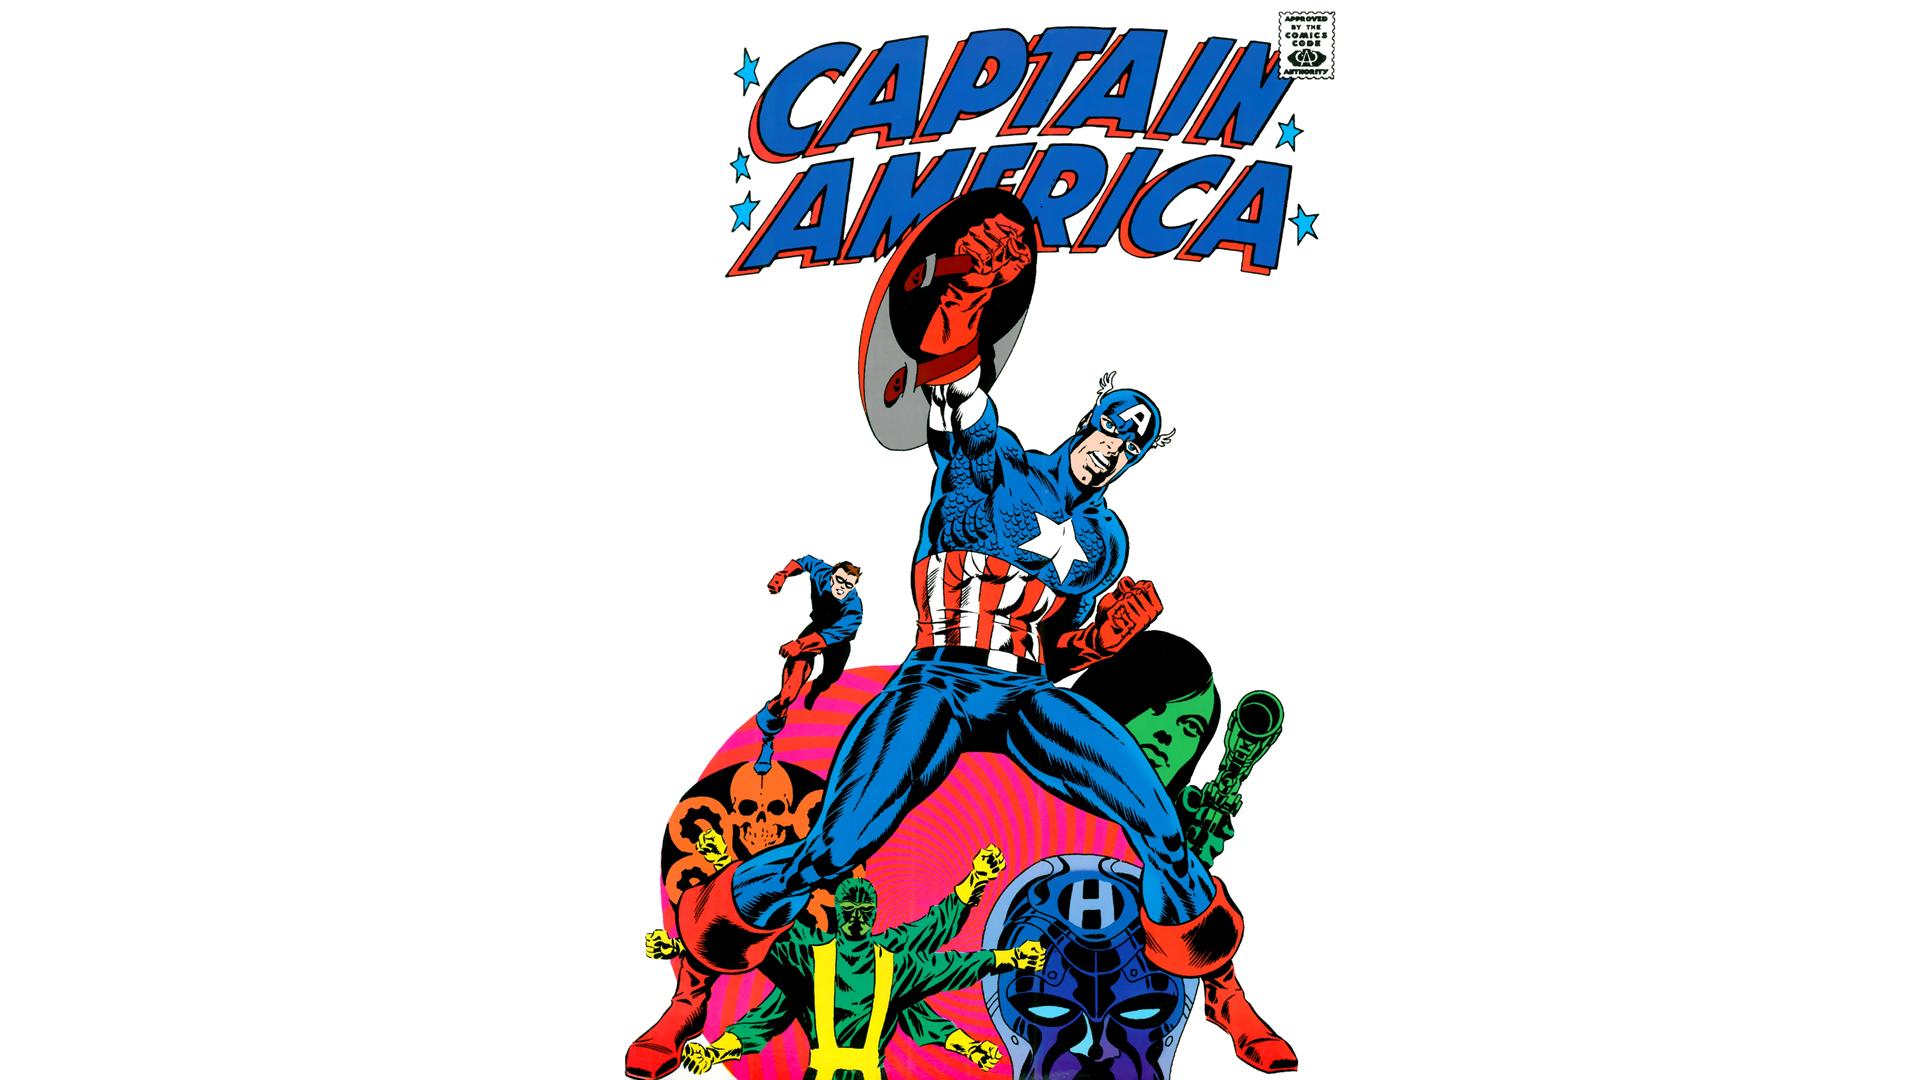 Captain America Wallpaper 1920x1080 Captain America Marvel Comics 1920x1080